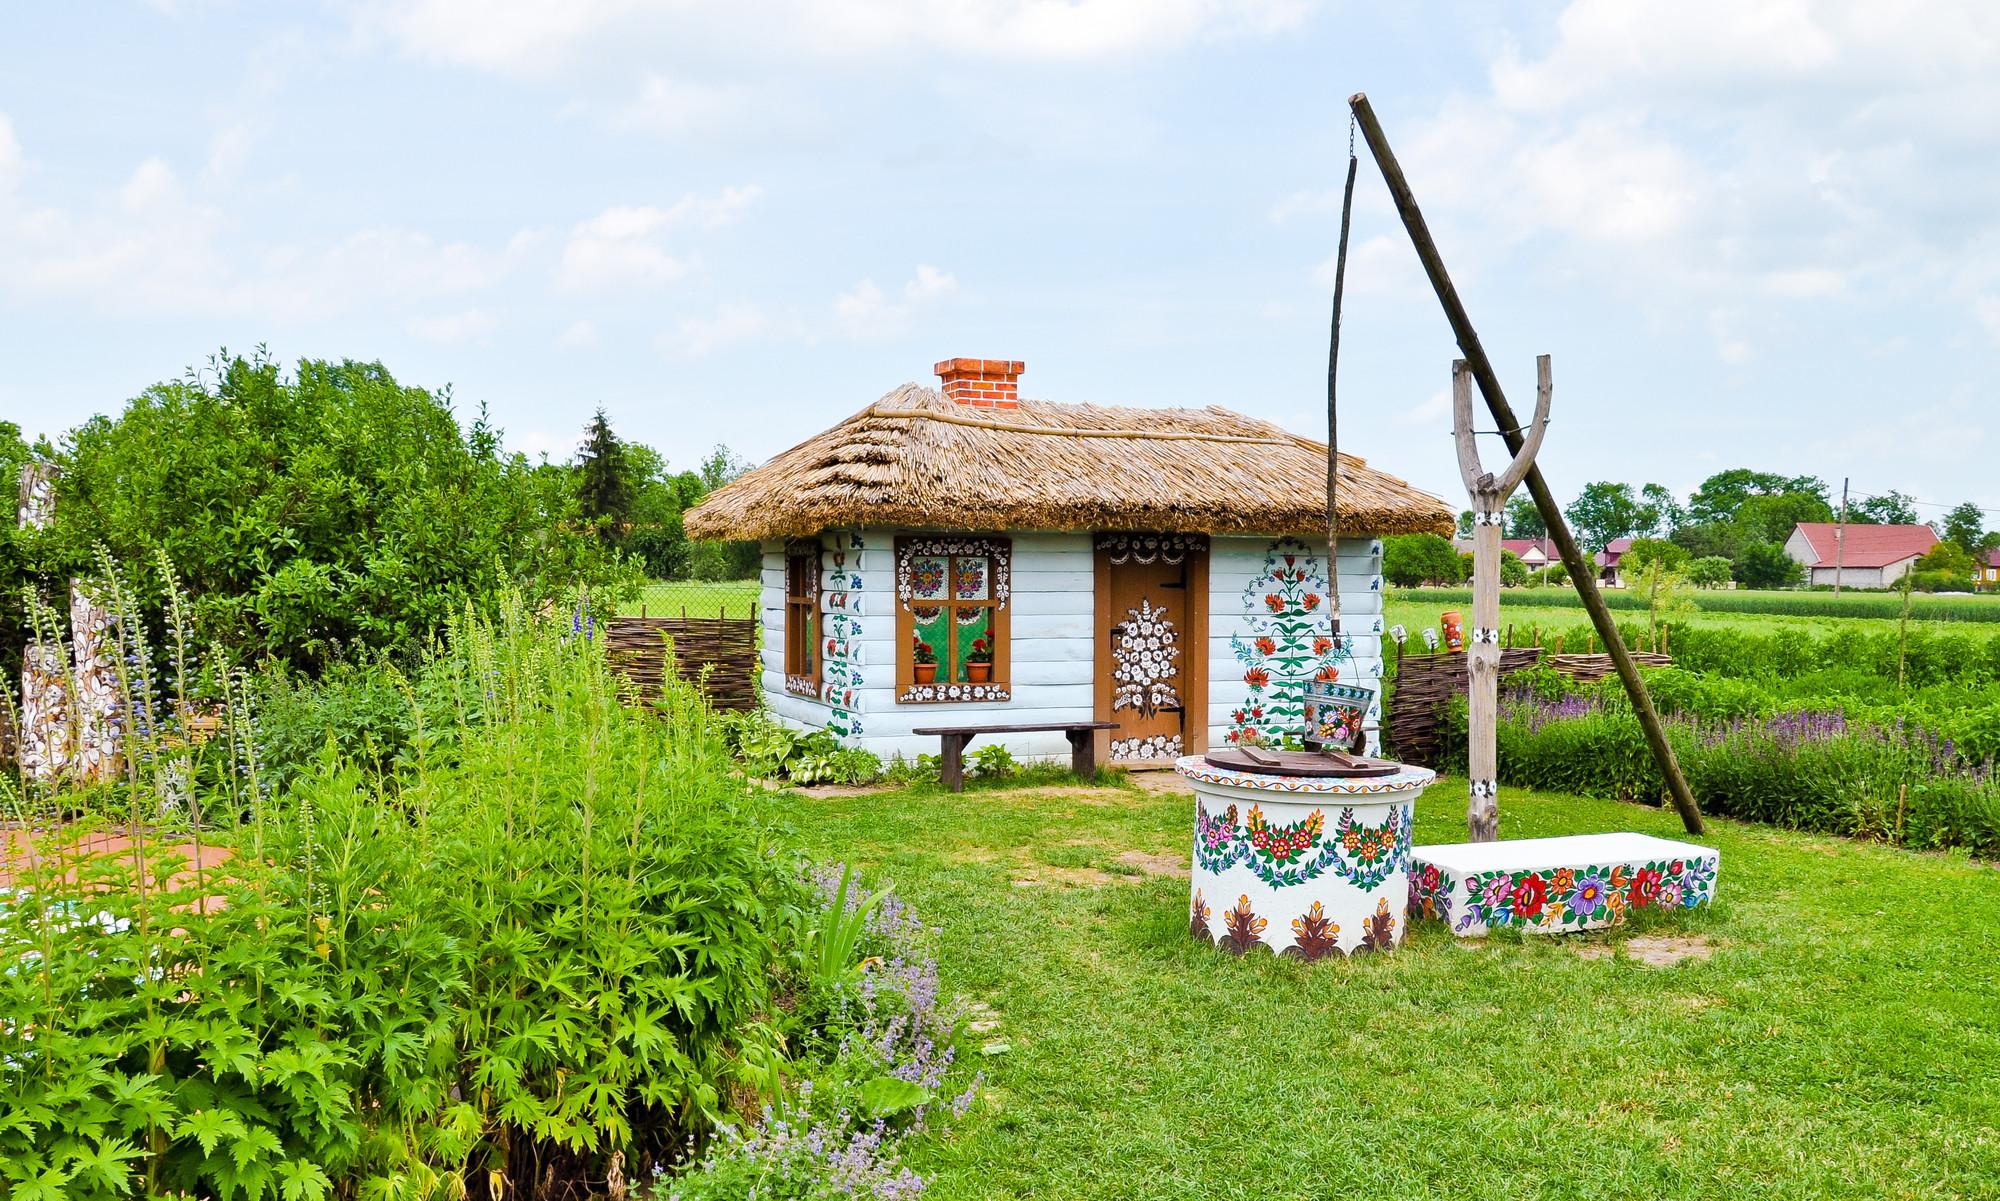 Zalipie: The Painted Village | Polish Folk Art